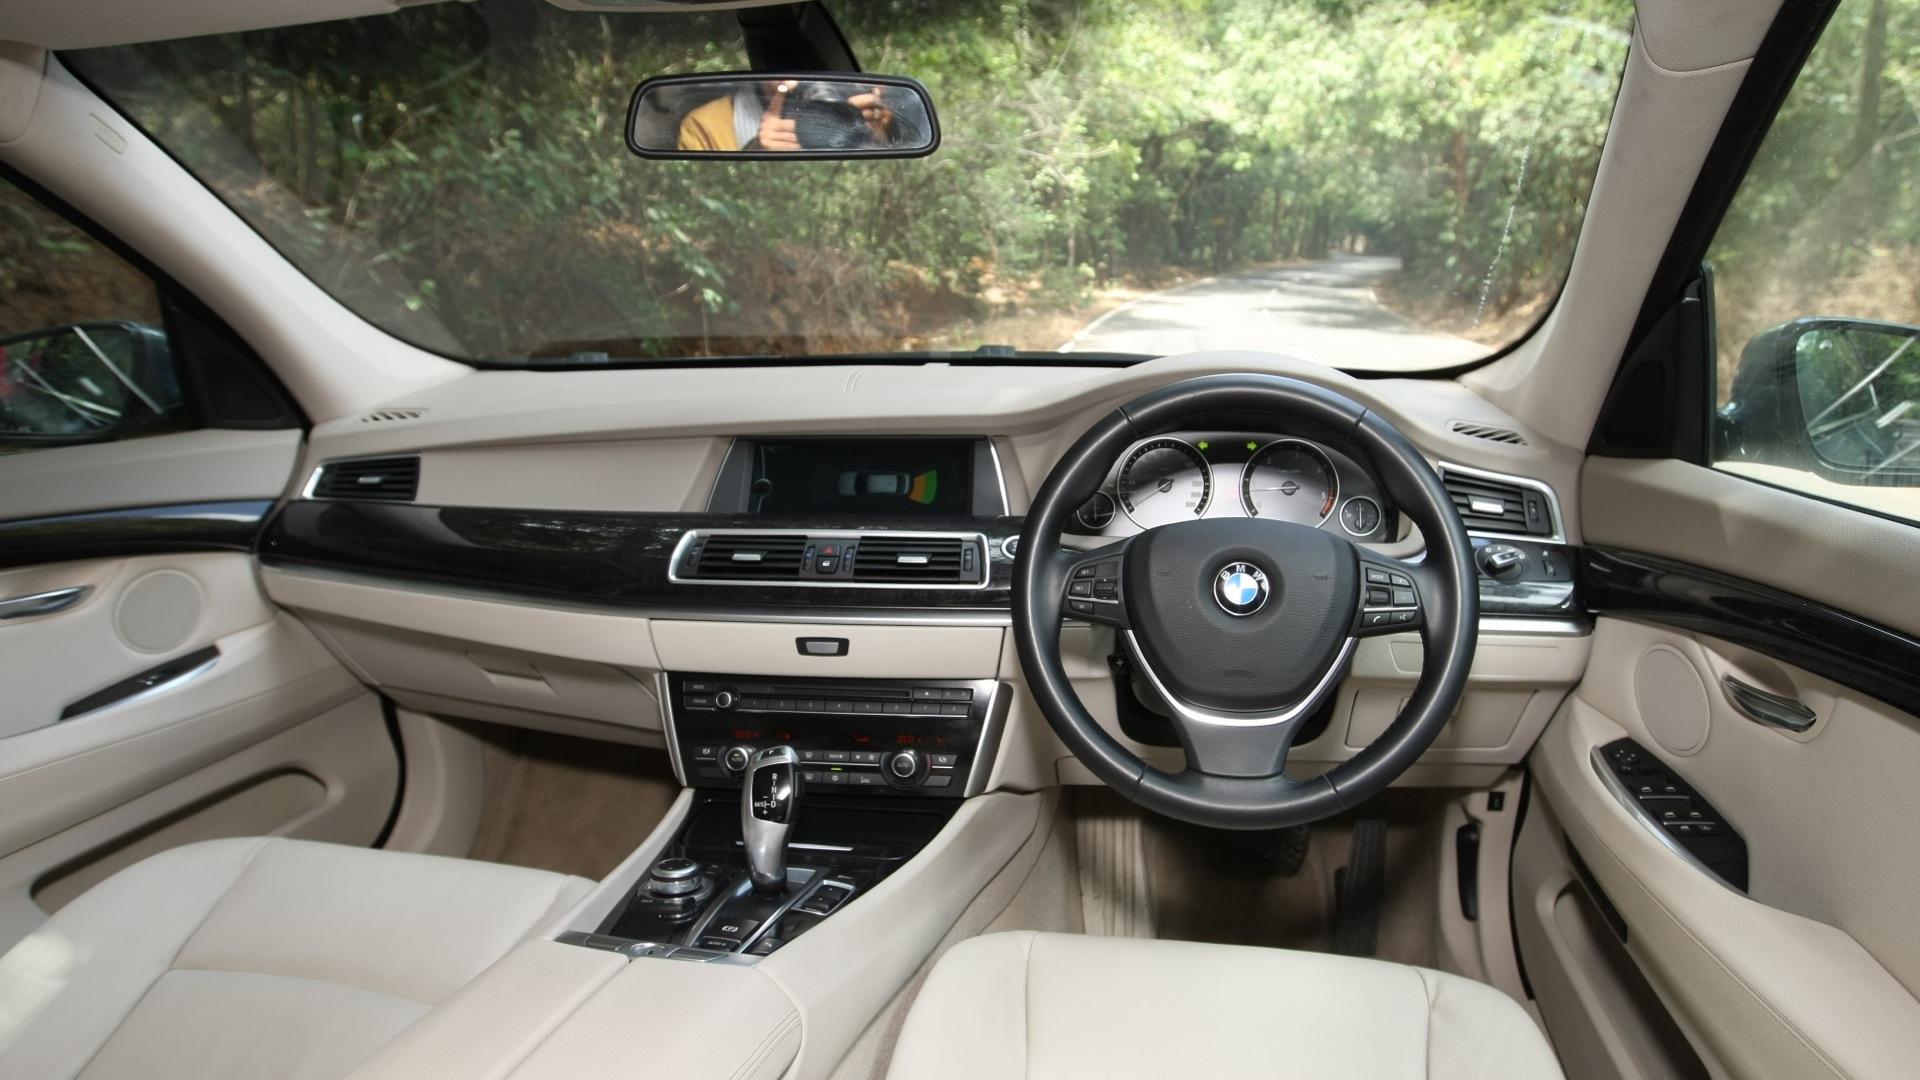 Bmw 5 Series Gt 2013 530d Interior Car Photos Overdrive